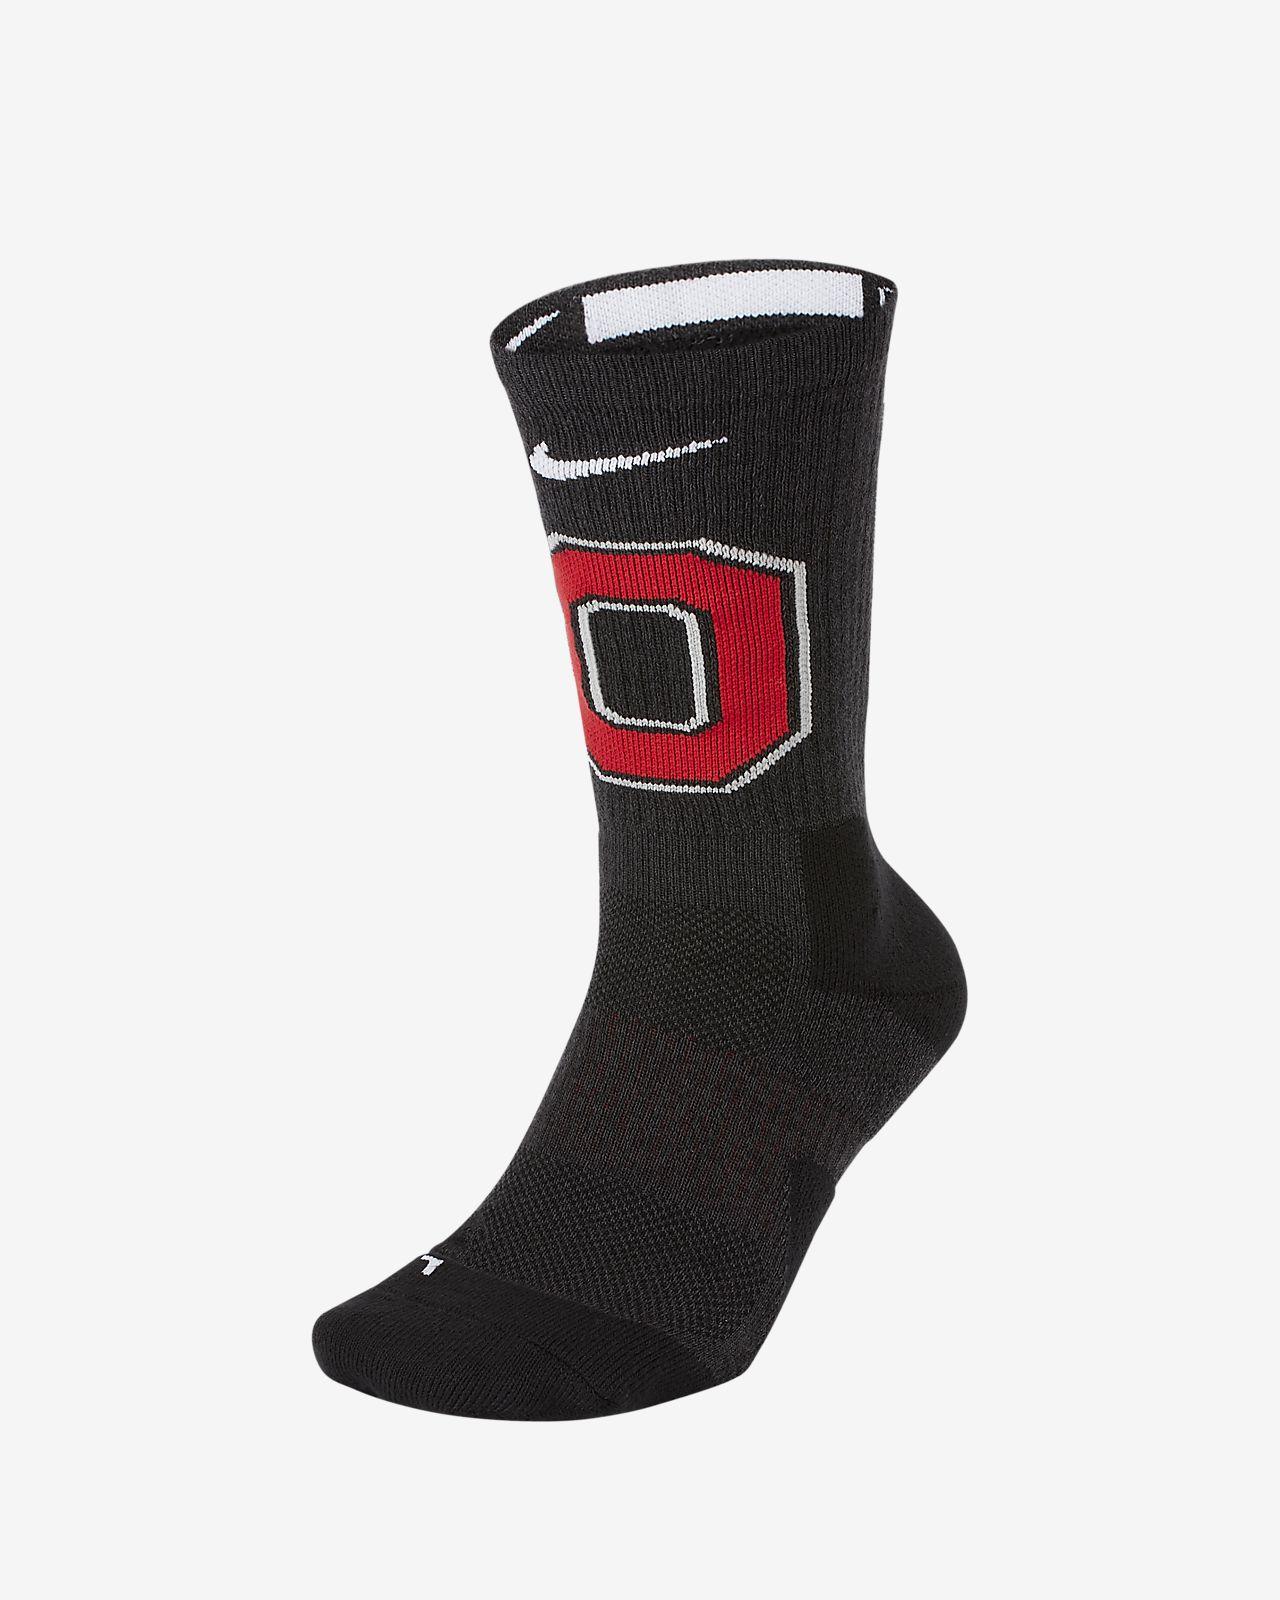 Nike College Elite (Ohio State) Basketball Crew Socks